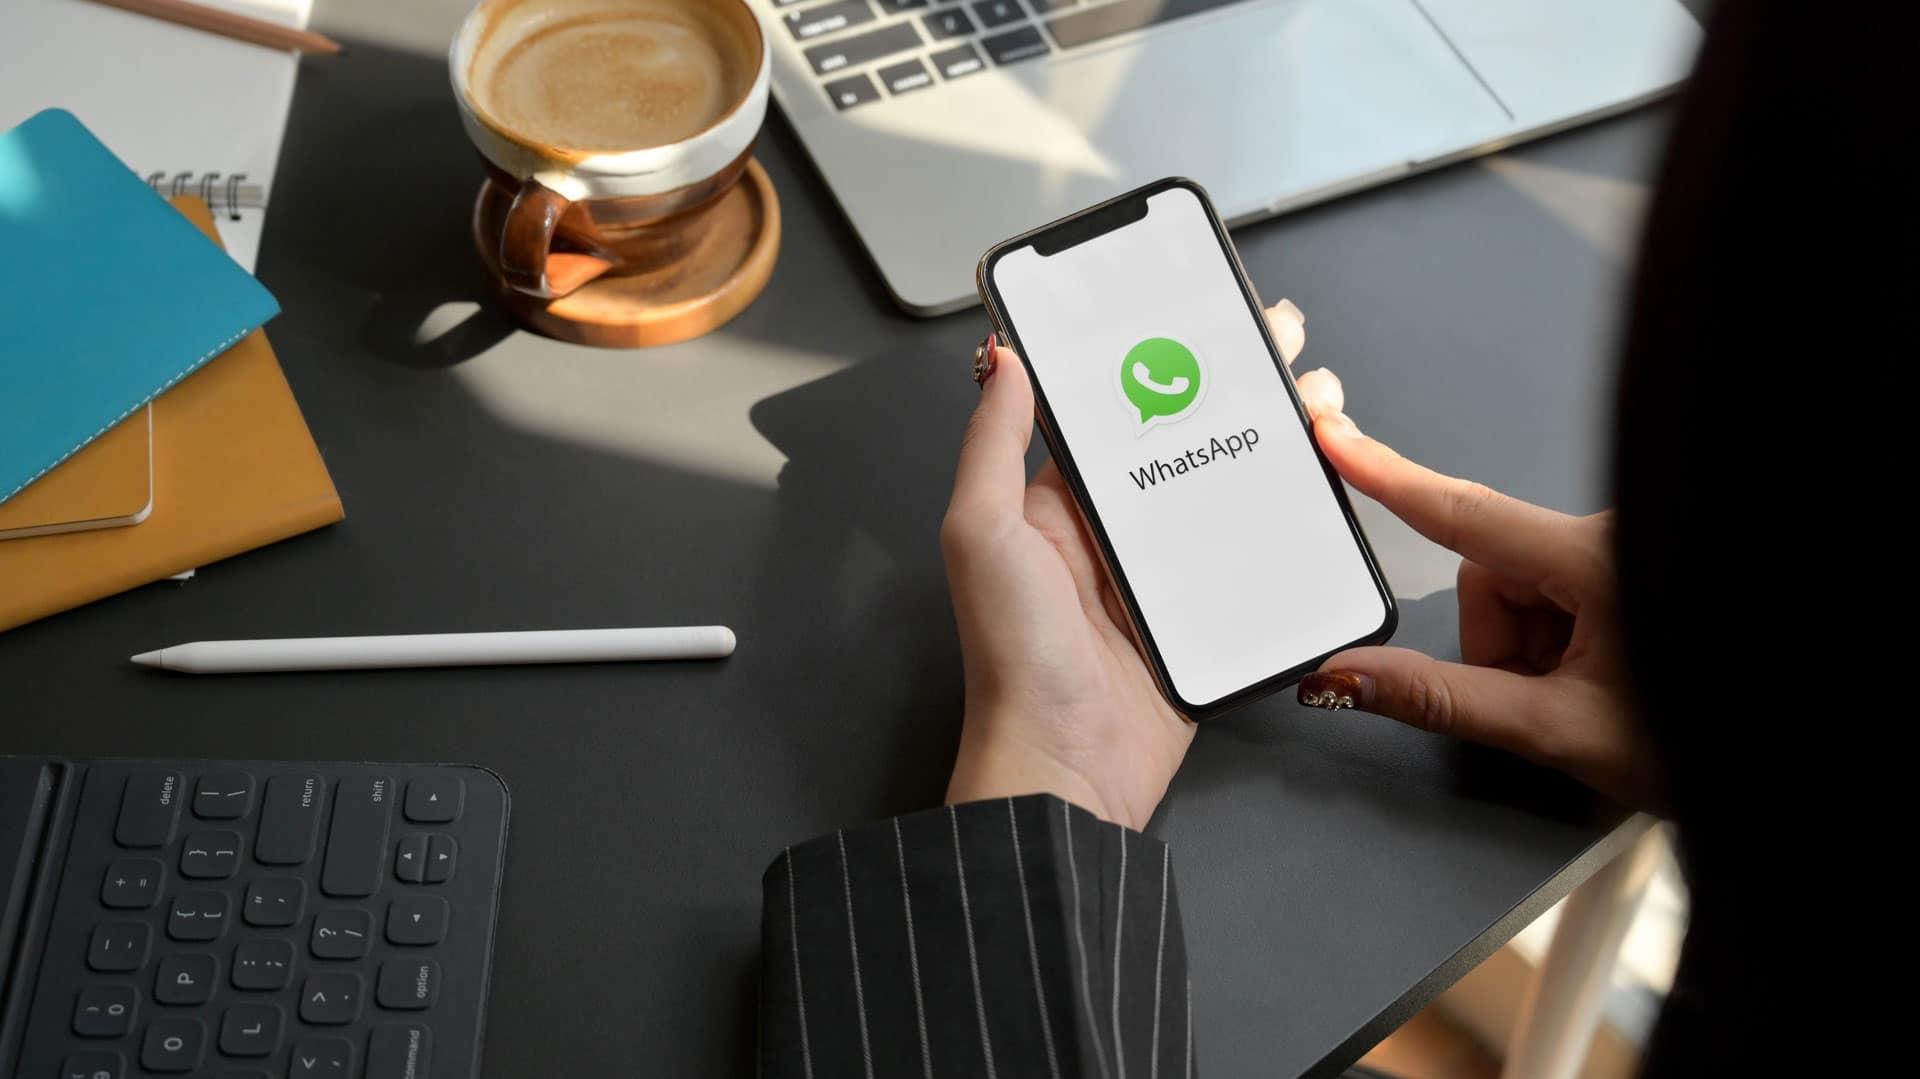 Whatsapp» Repro One